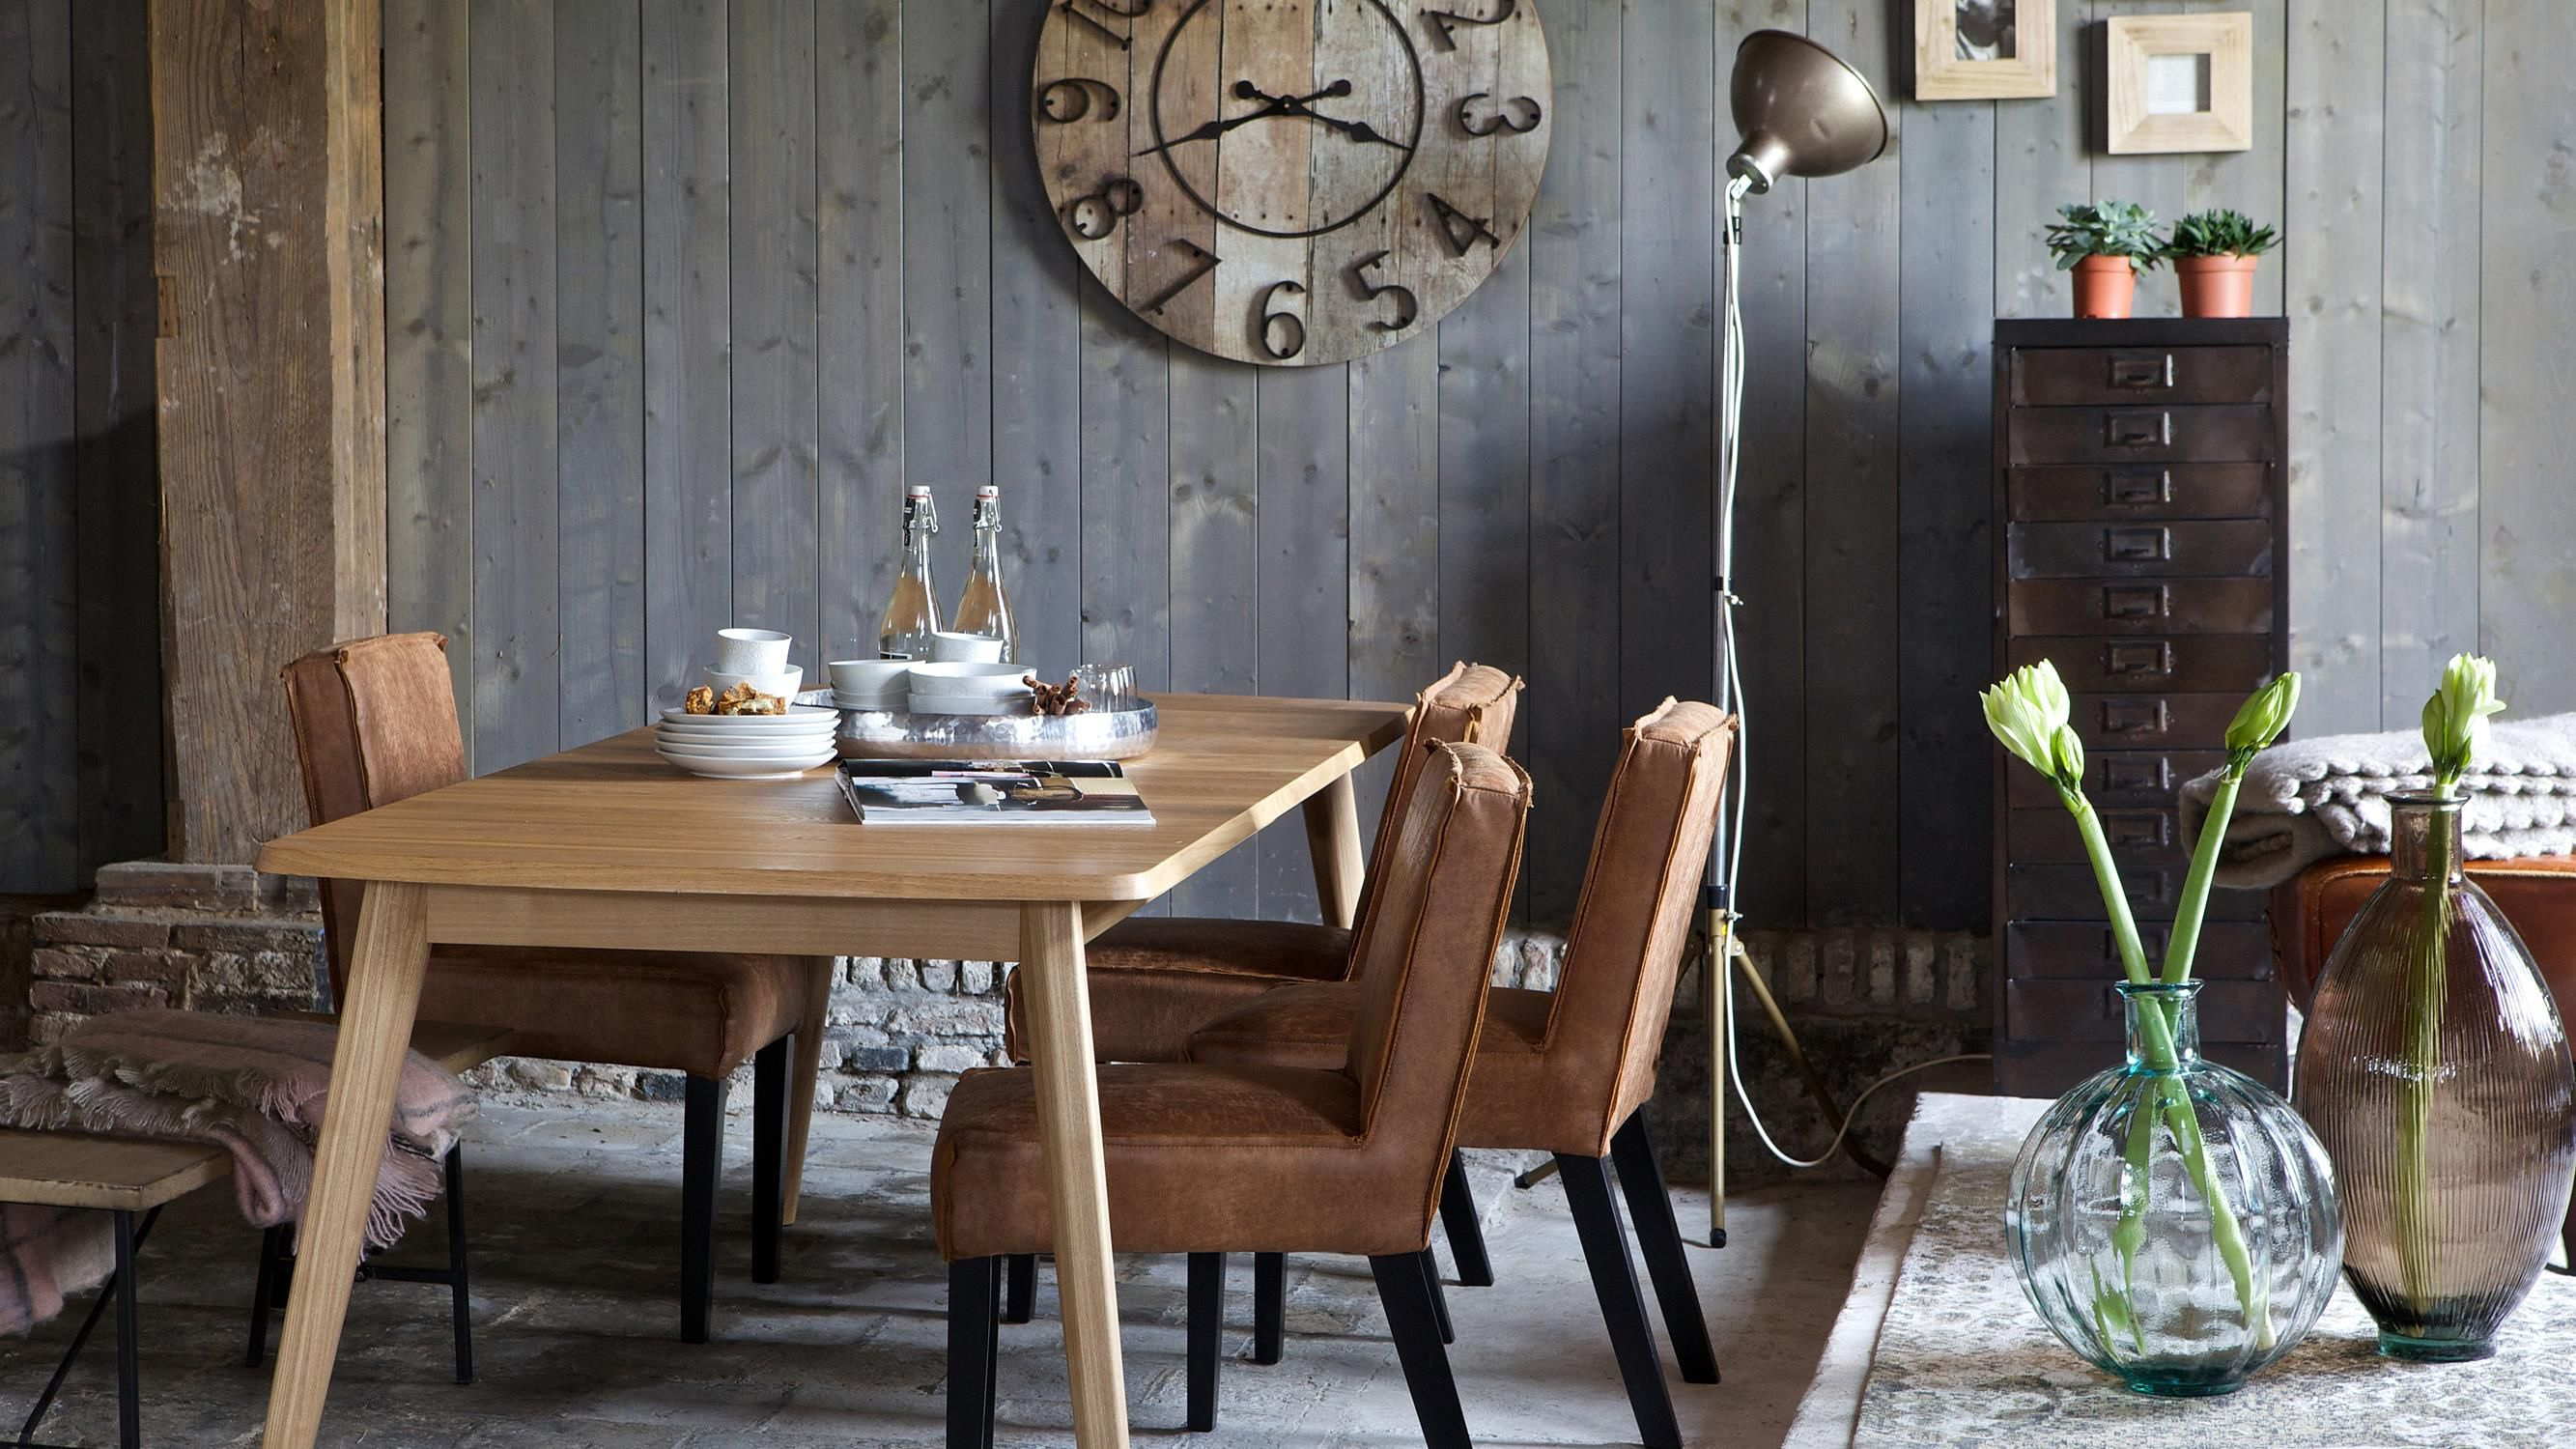 Be Pure Stoel : Be pure stół oxford krzesła rodeo opinie i atrakcyjne ceny na